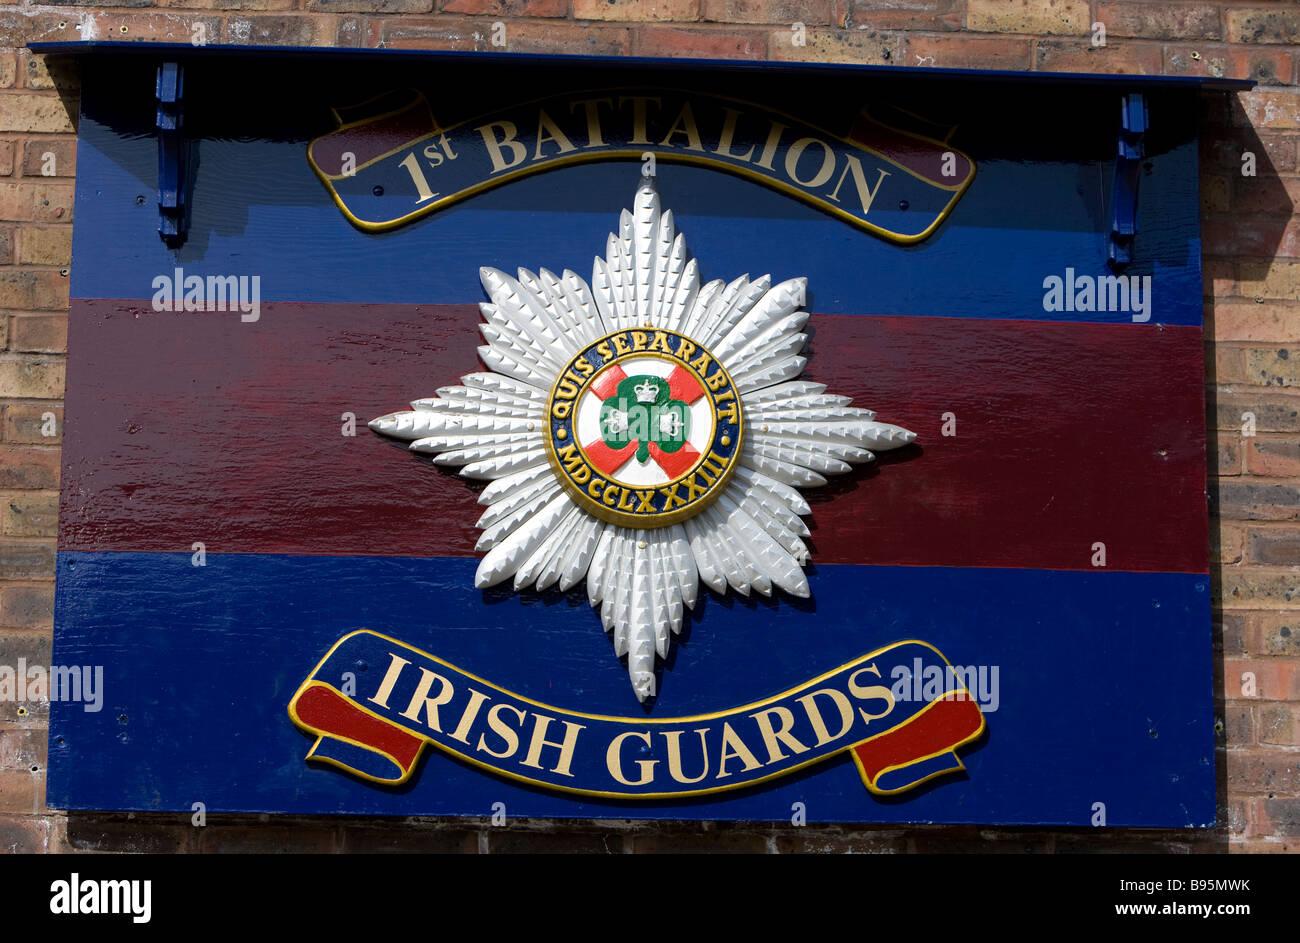 The 1st Battalion the Irish Guards sign at Victoria Barracks Windsor UK - Stock Image